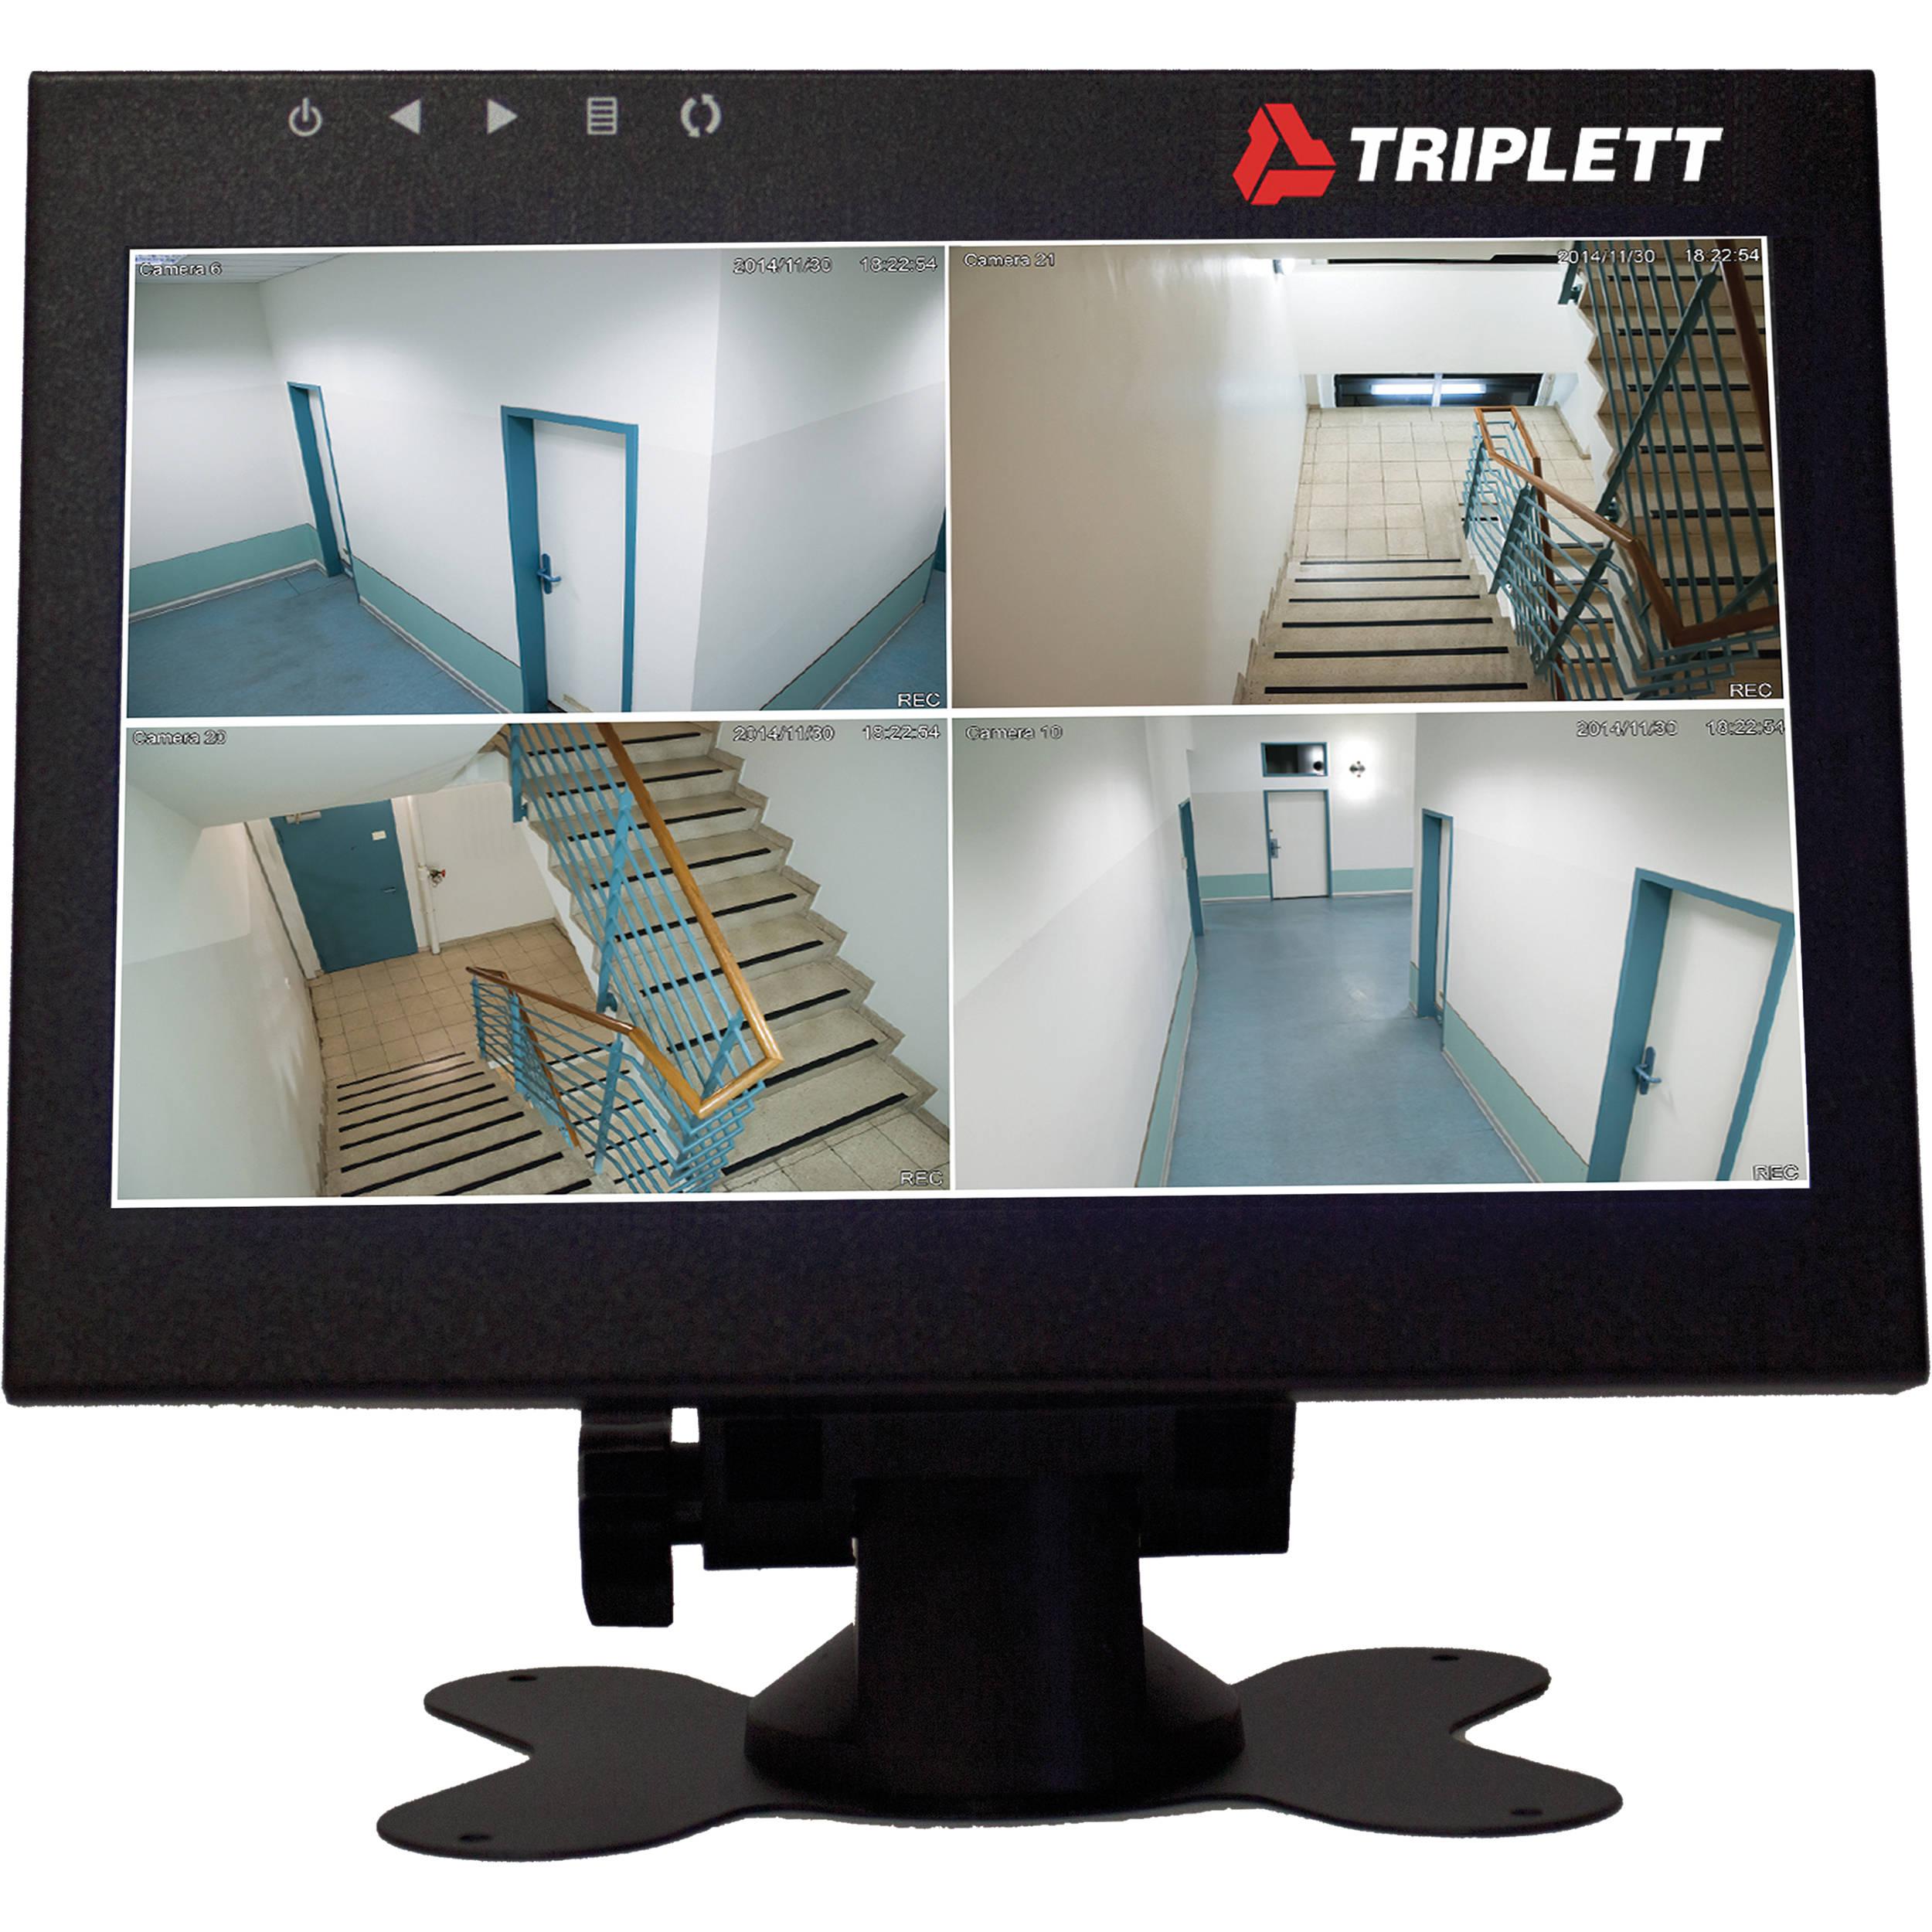 Triplett HDCM2 7